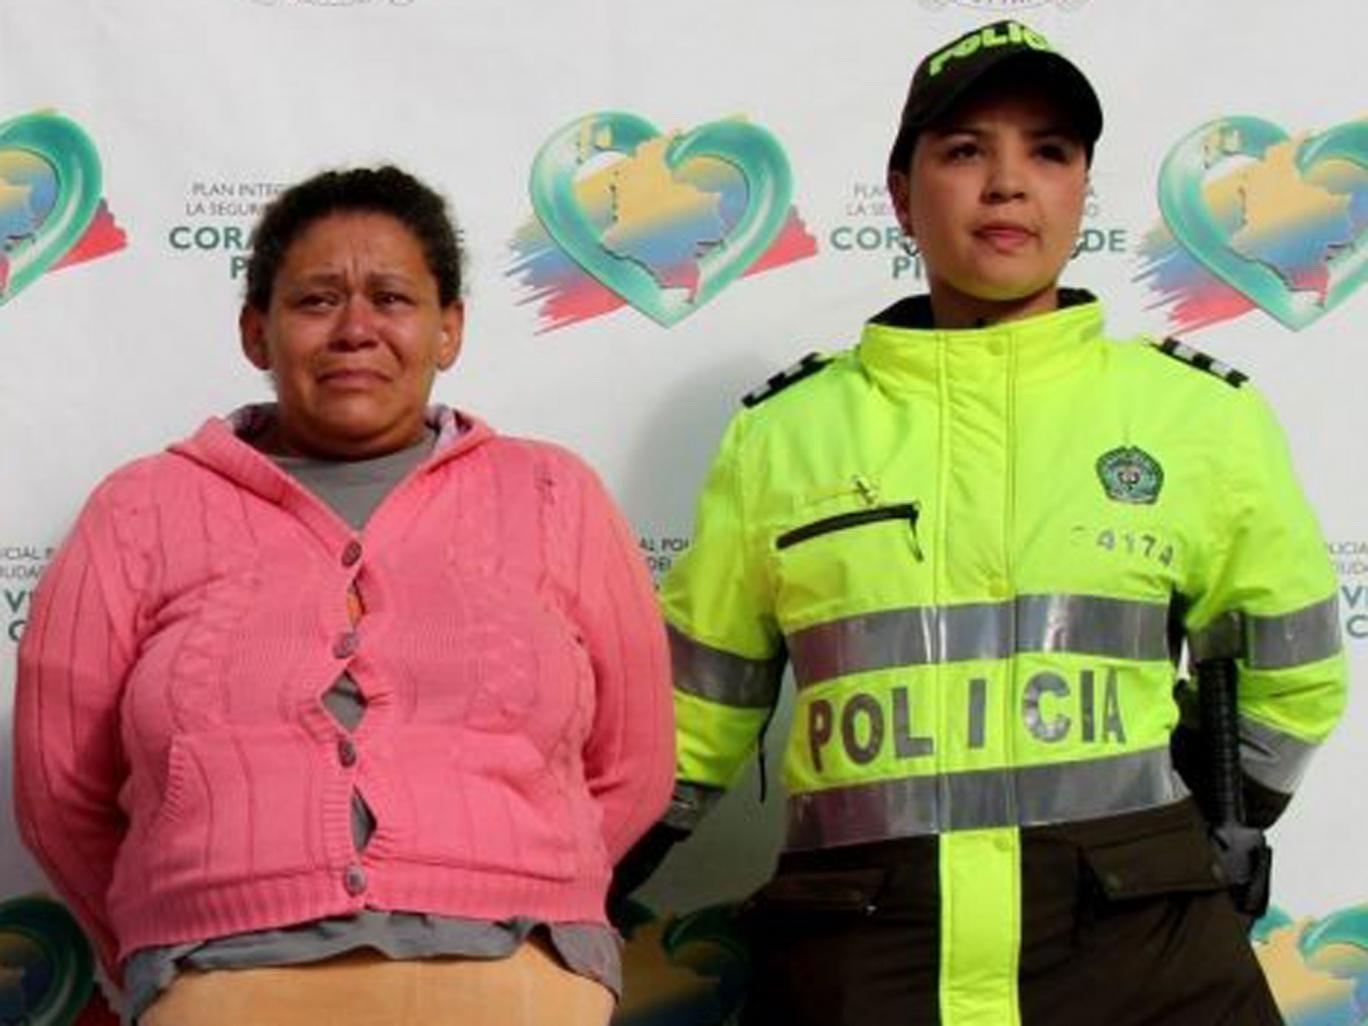 Margarita de Jesus Zapata Moreno, 45, has been arrested in Bogota for selling the virginities of 12 of her young daughters